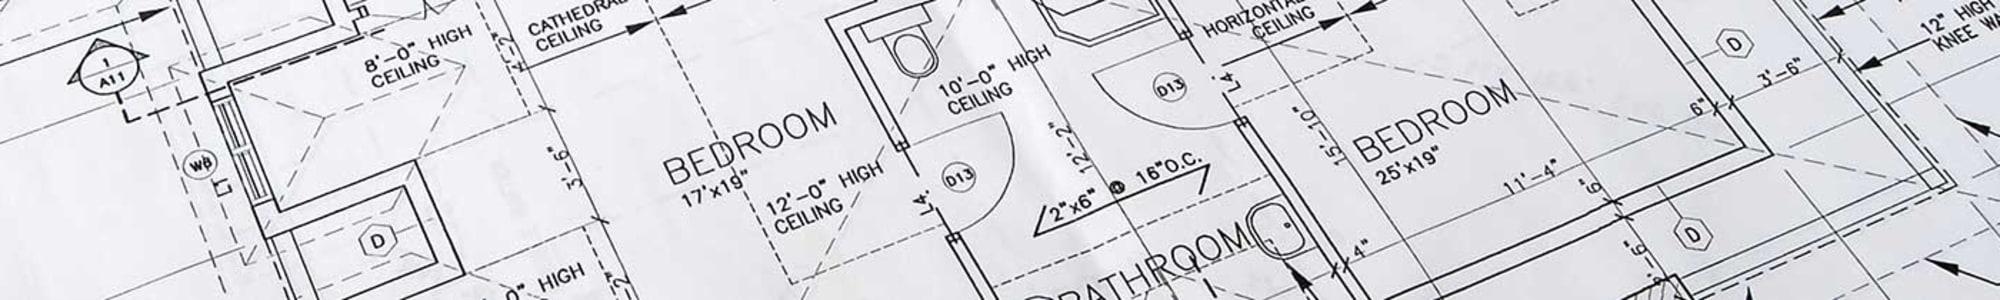 Floor plans at Mirror Lake Village Senior Living Community in Federal Way, Washington